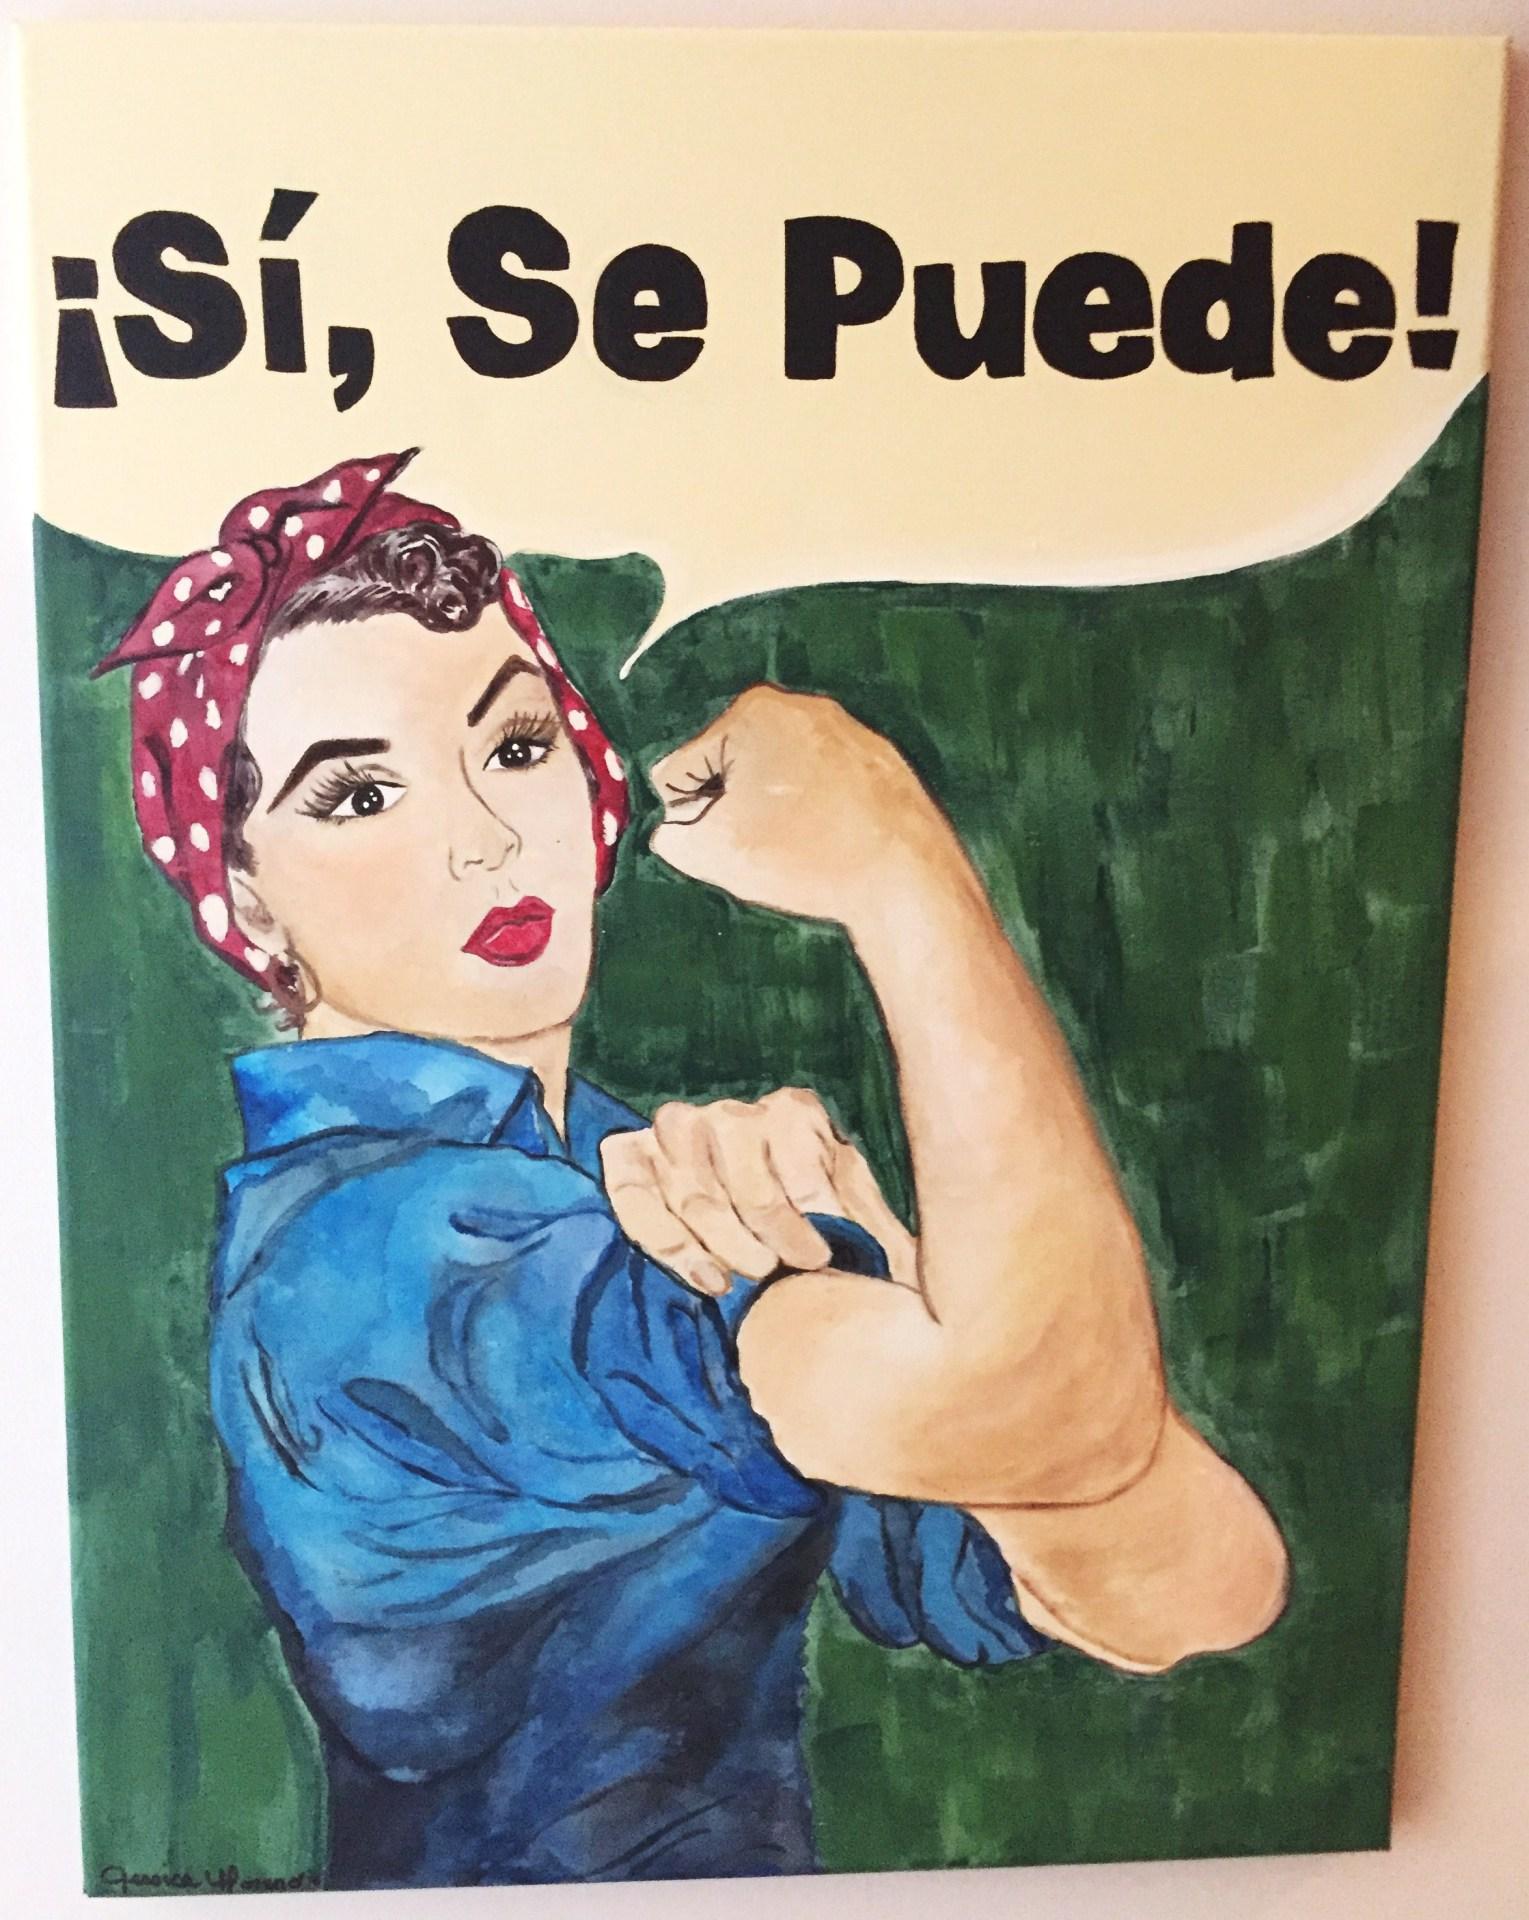 Latina Rosie the Riveter